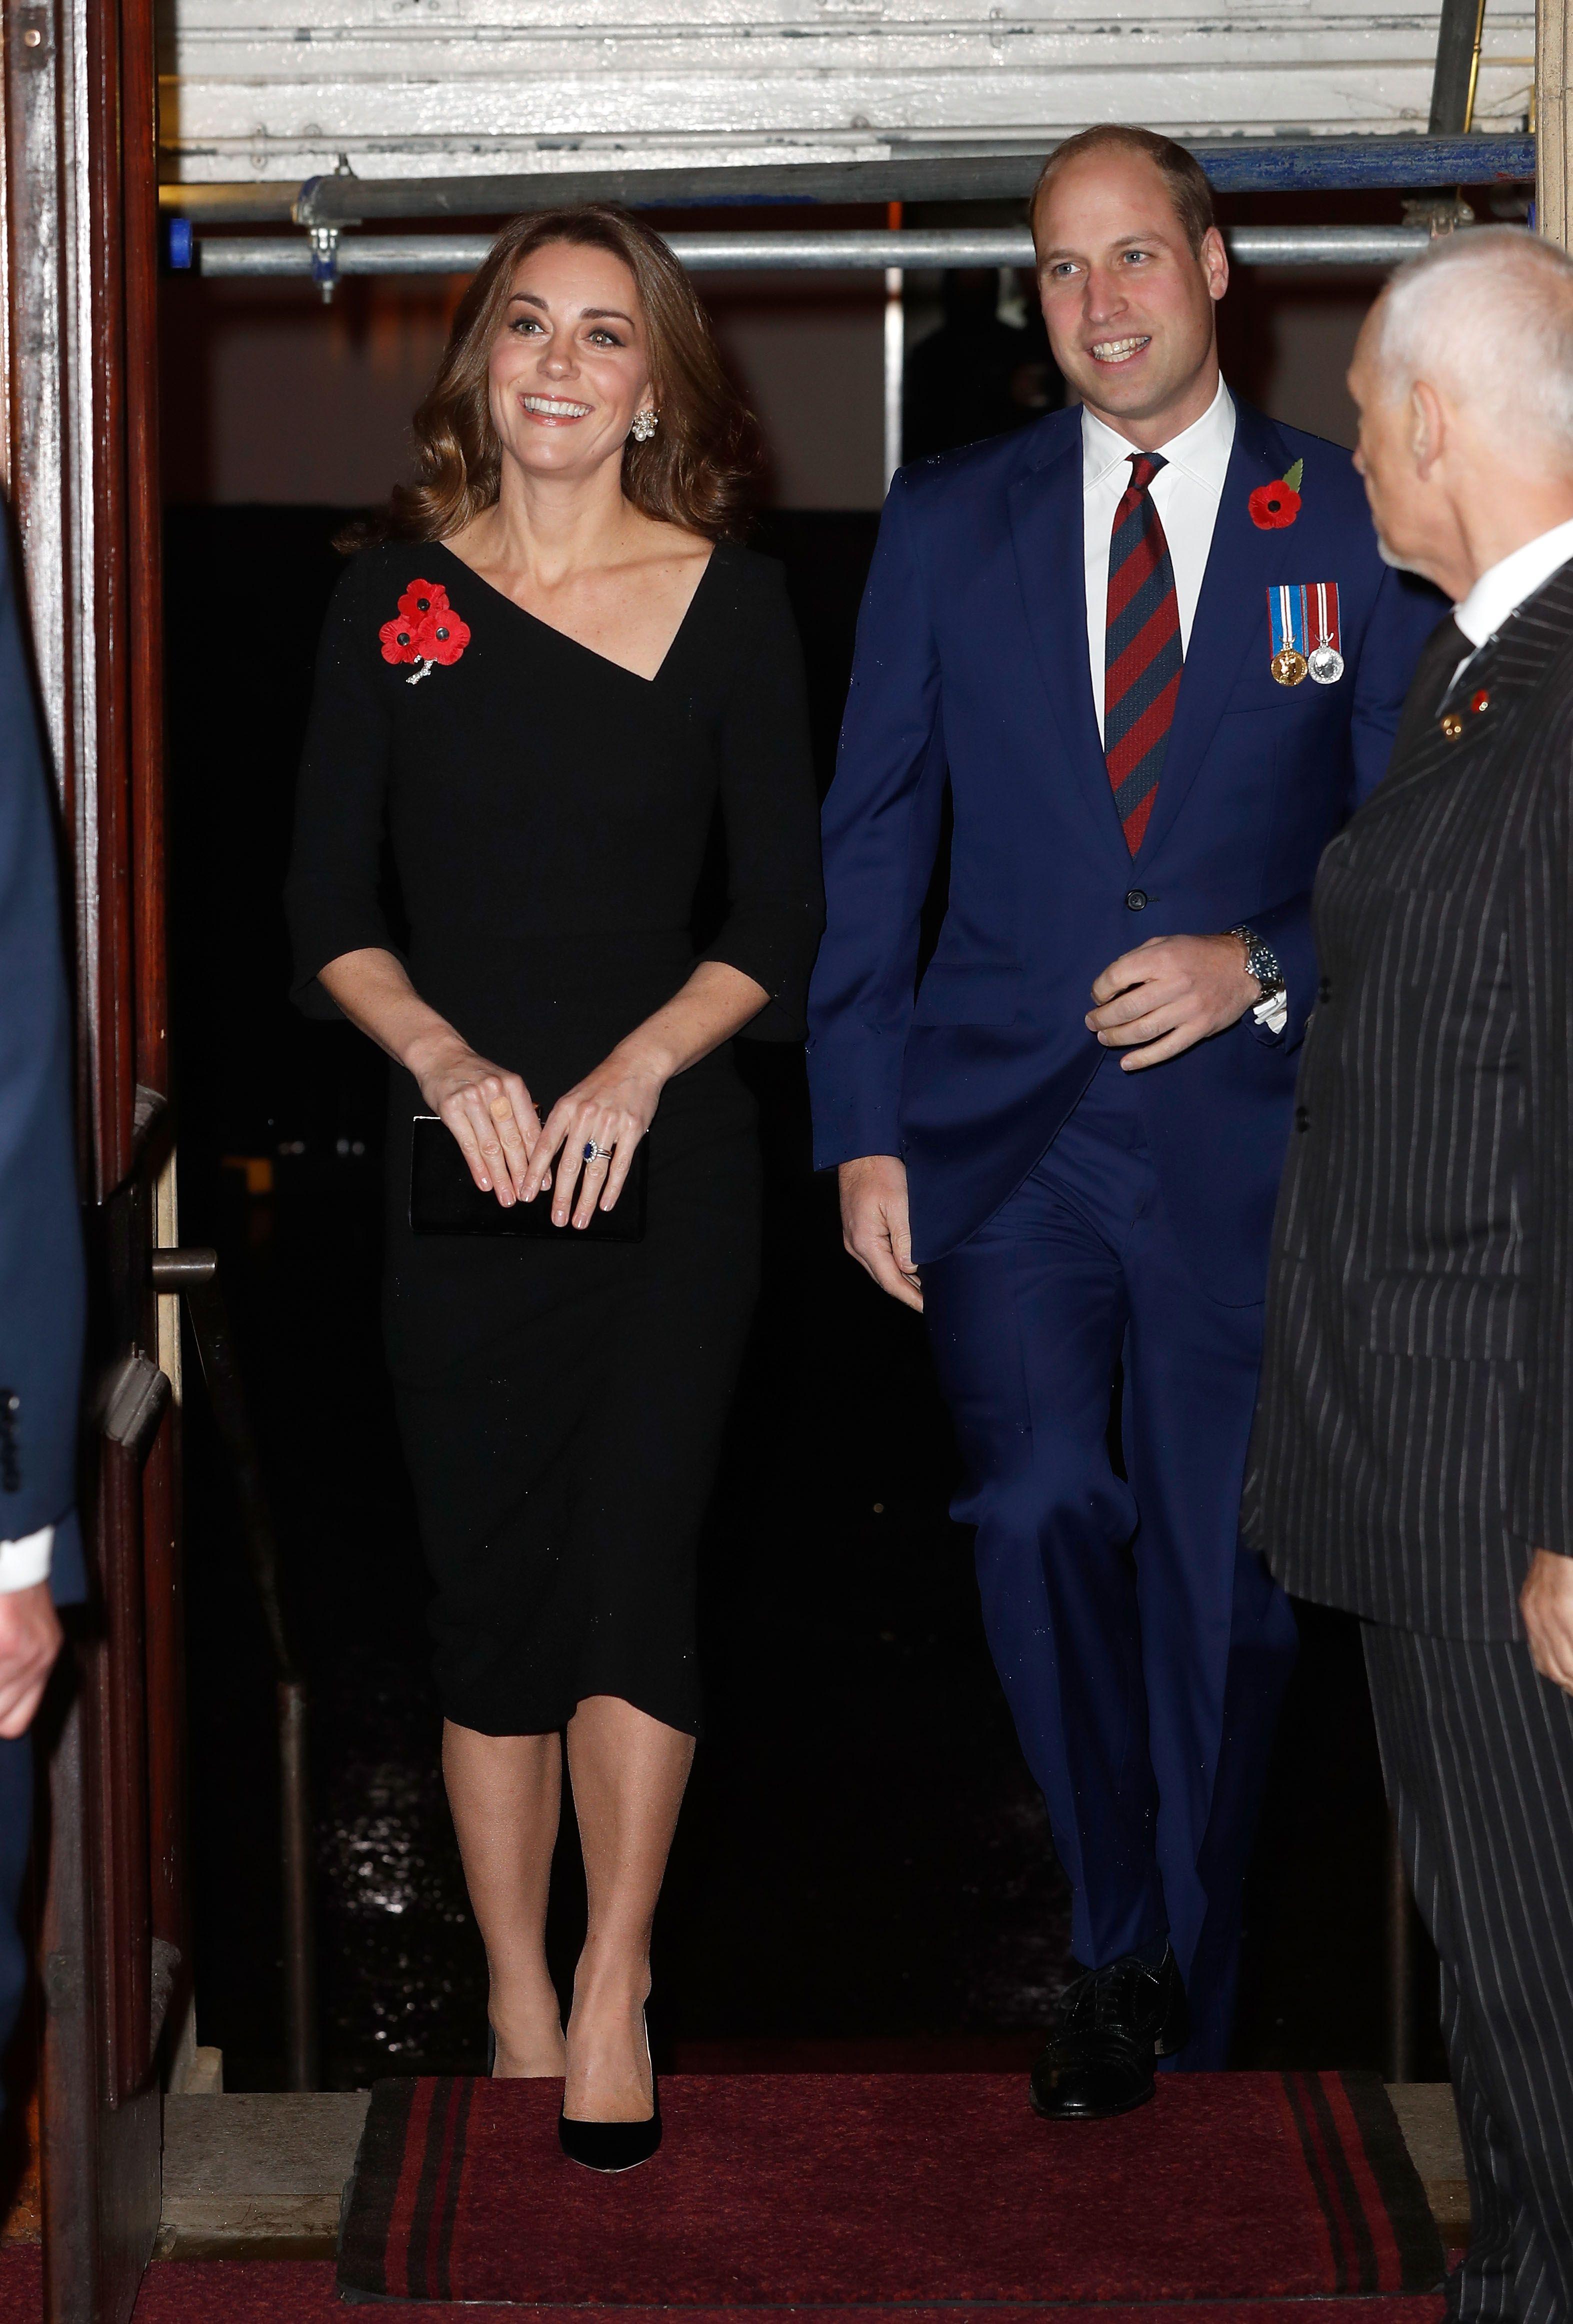 Znalezione obrazy dla zapytania festival of remembrance duchess kate 2018